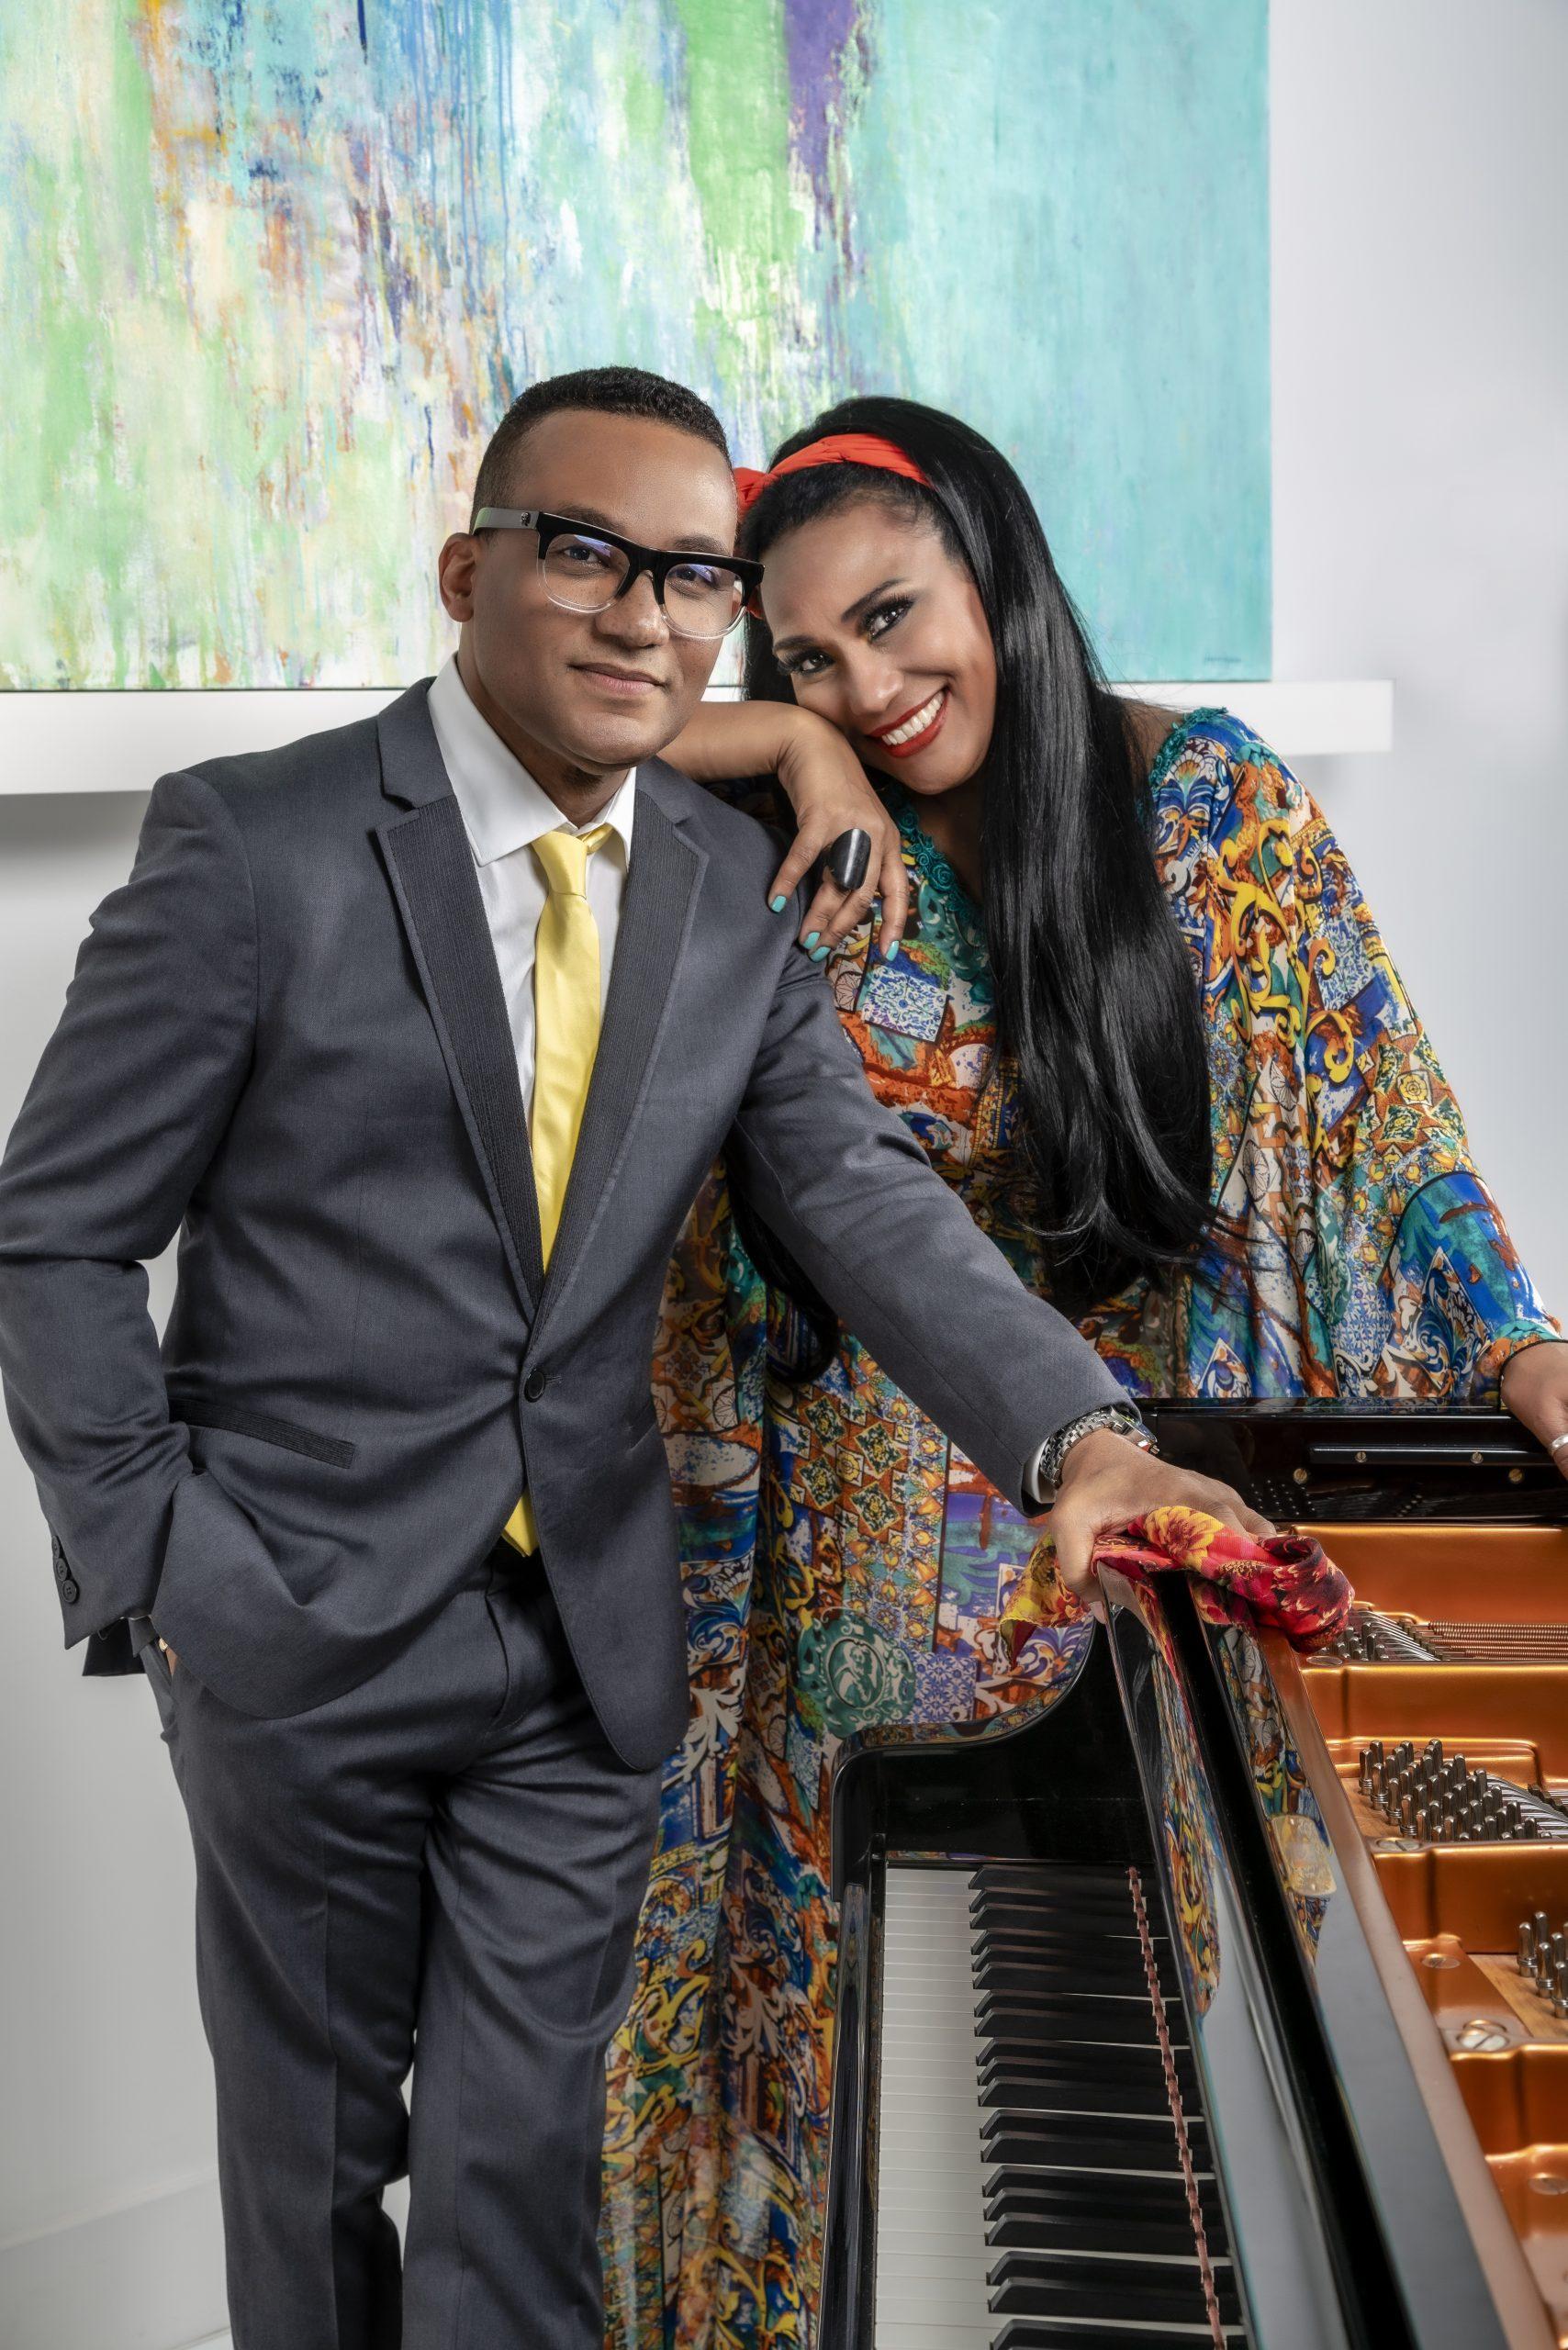 PODCAST: Gonzalo Rubalcaba & Aymée Nuviola on All That Jazz